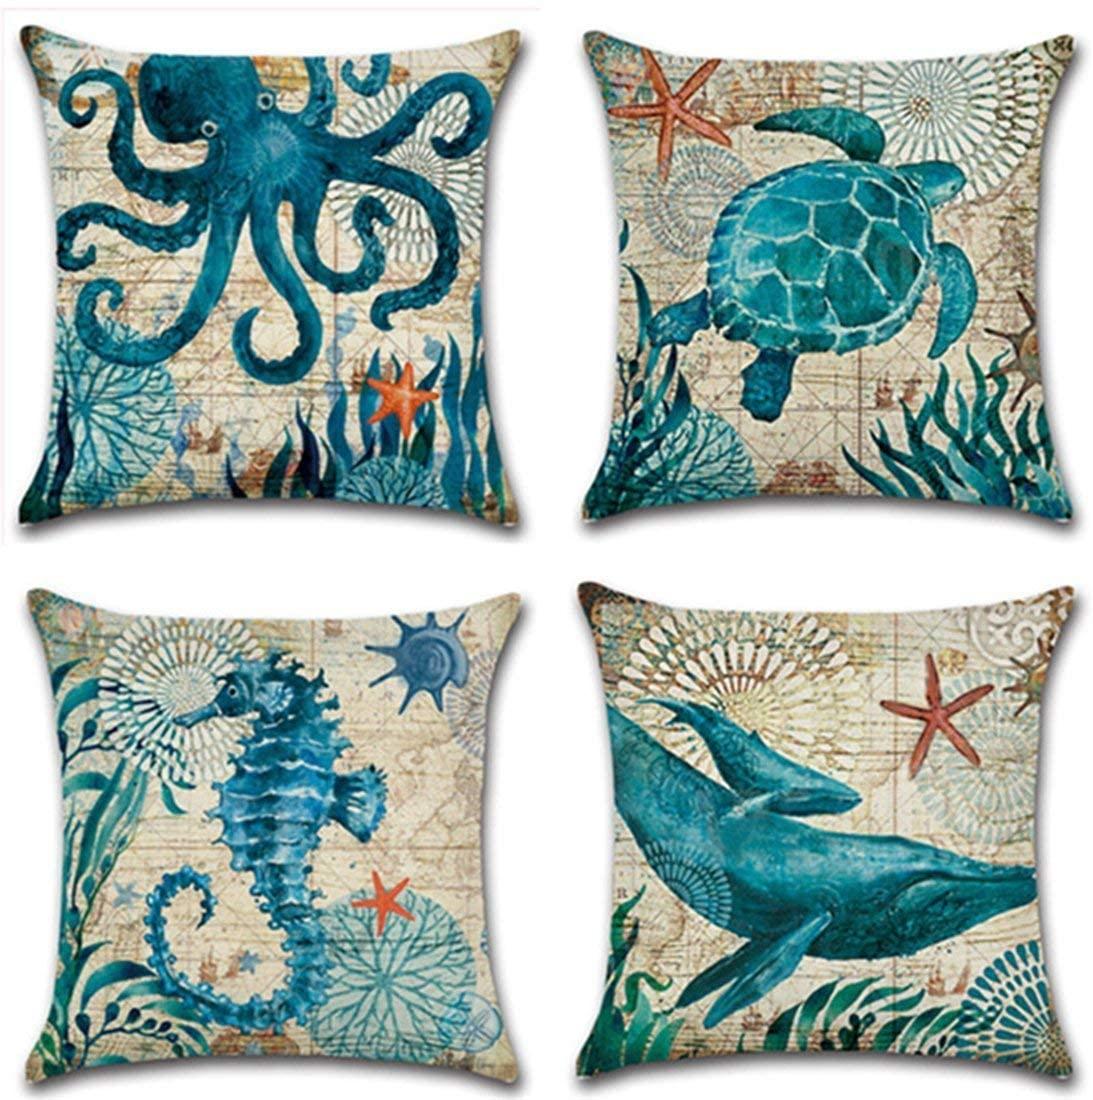 Granbey Turtle Octopus Whale Seahorse Coastal Throw Pillows Cover Nautical Style Ocean Theme Throw Pillow Covers Sea Decorative Square Linen Set of 4 18 x 18 Inch Mediterranean Pillowcases